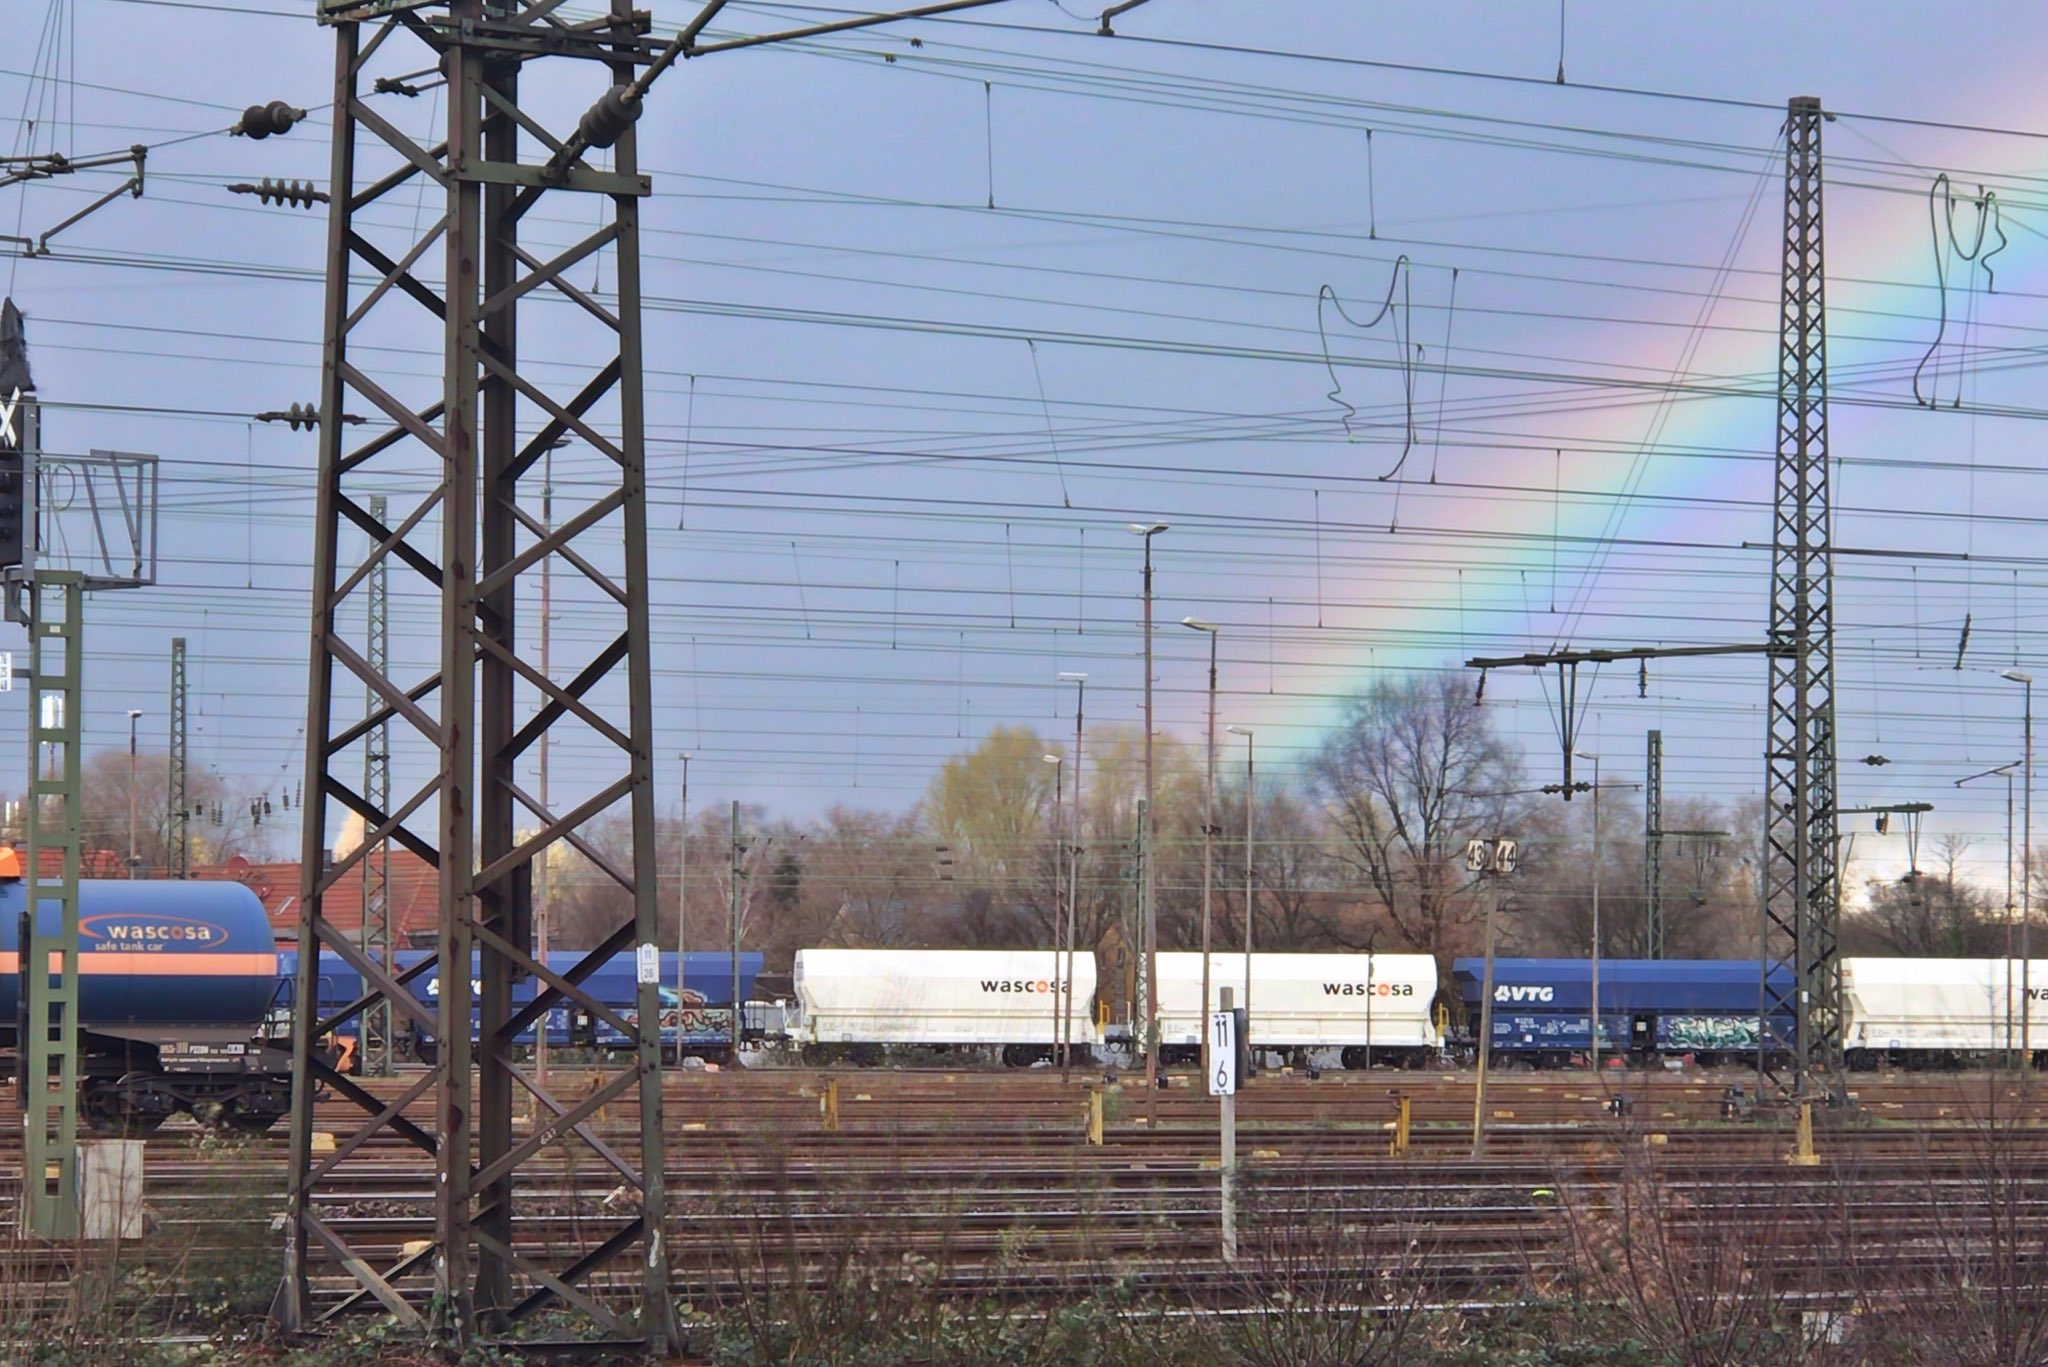 Gerade so in #Oberhausen  #Ruhrpott https://t.co/KncFXDMz8Y